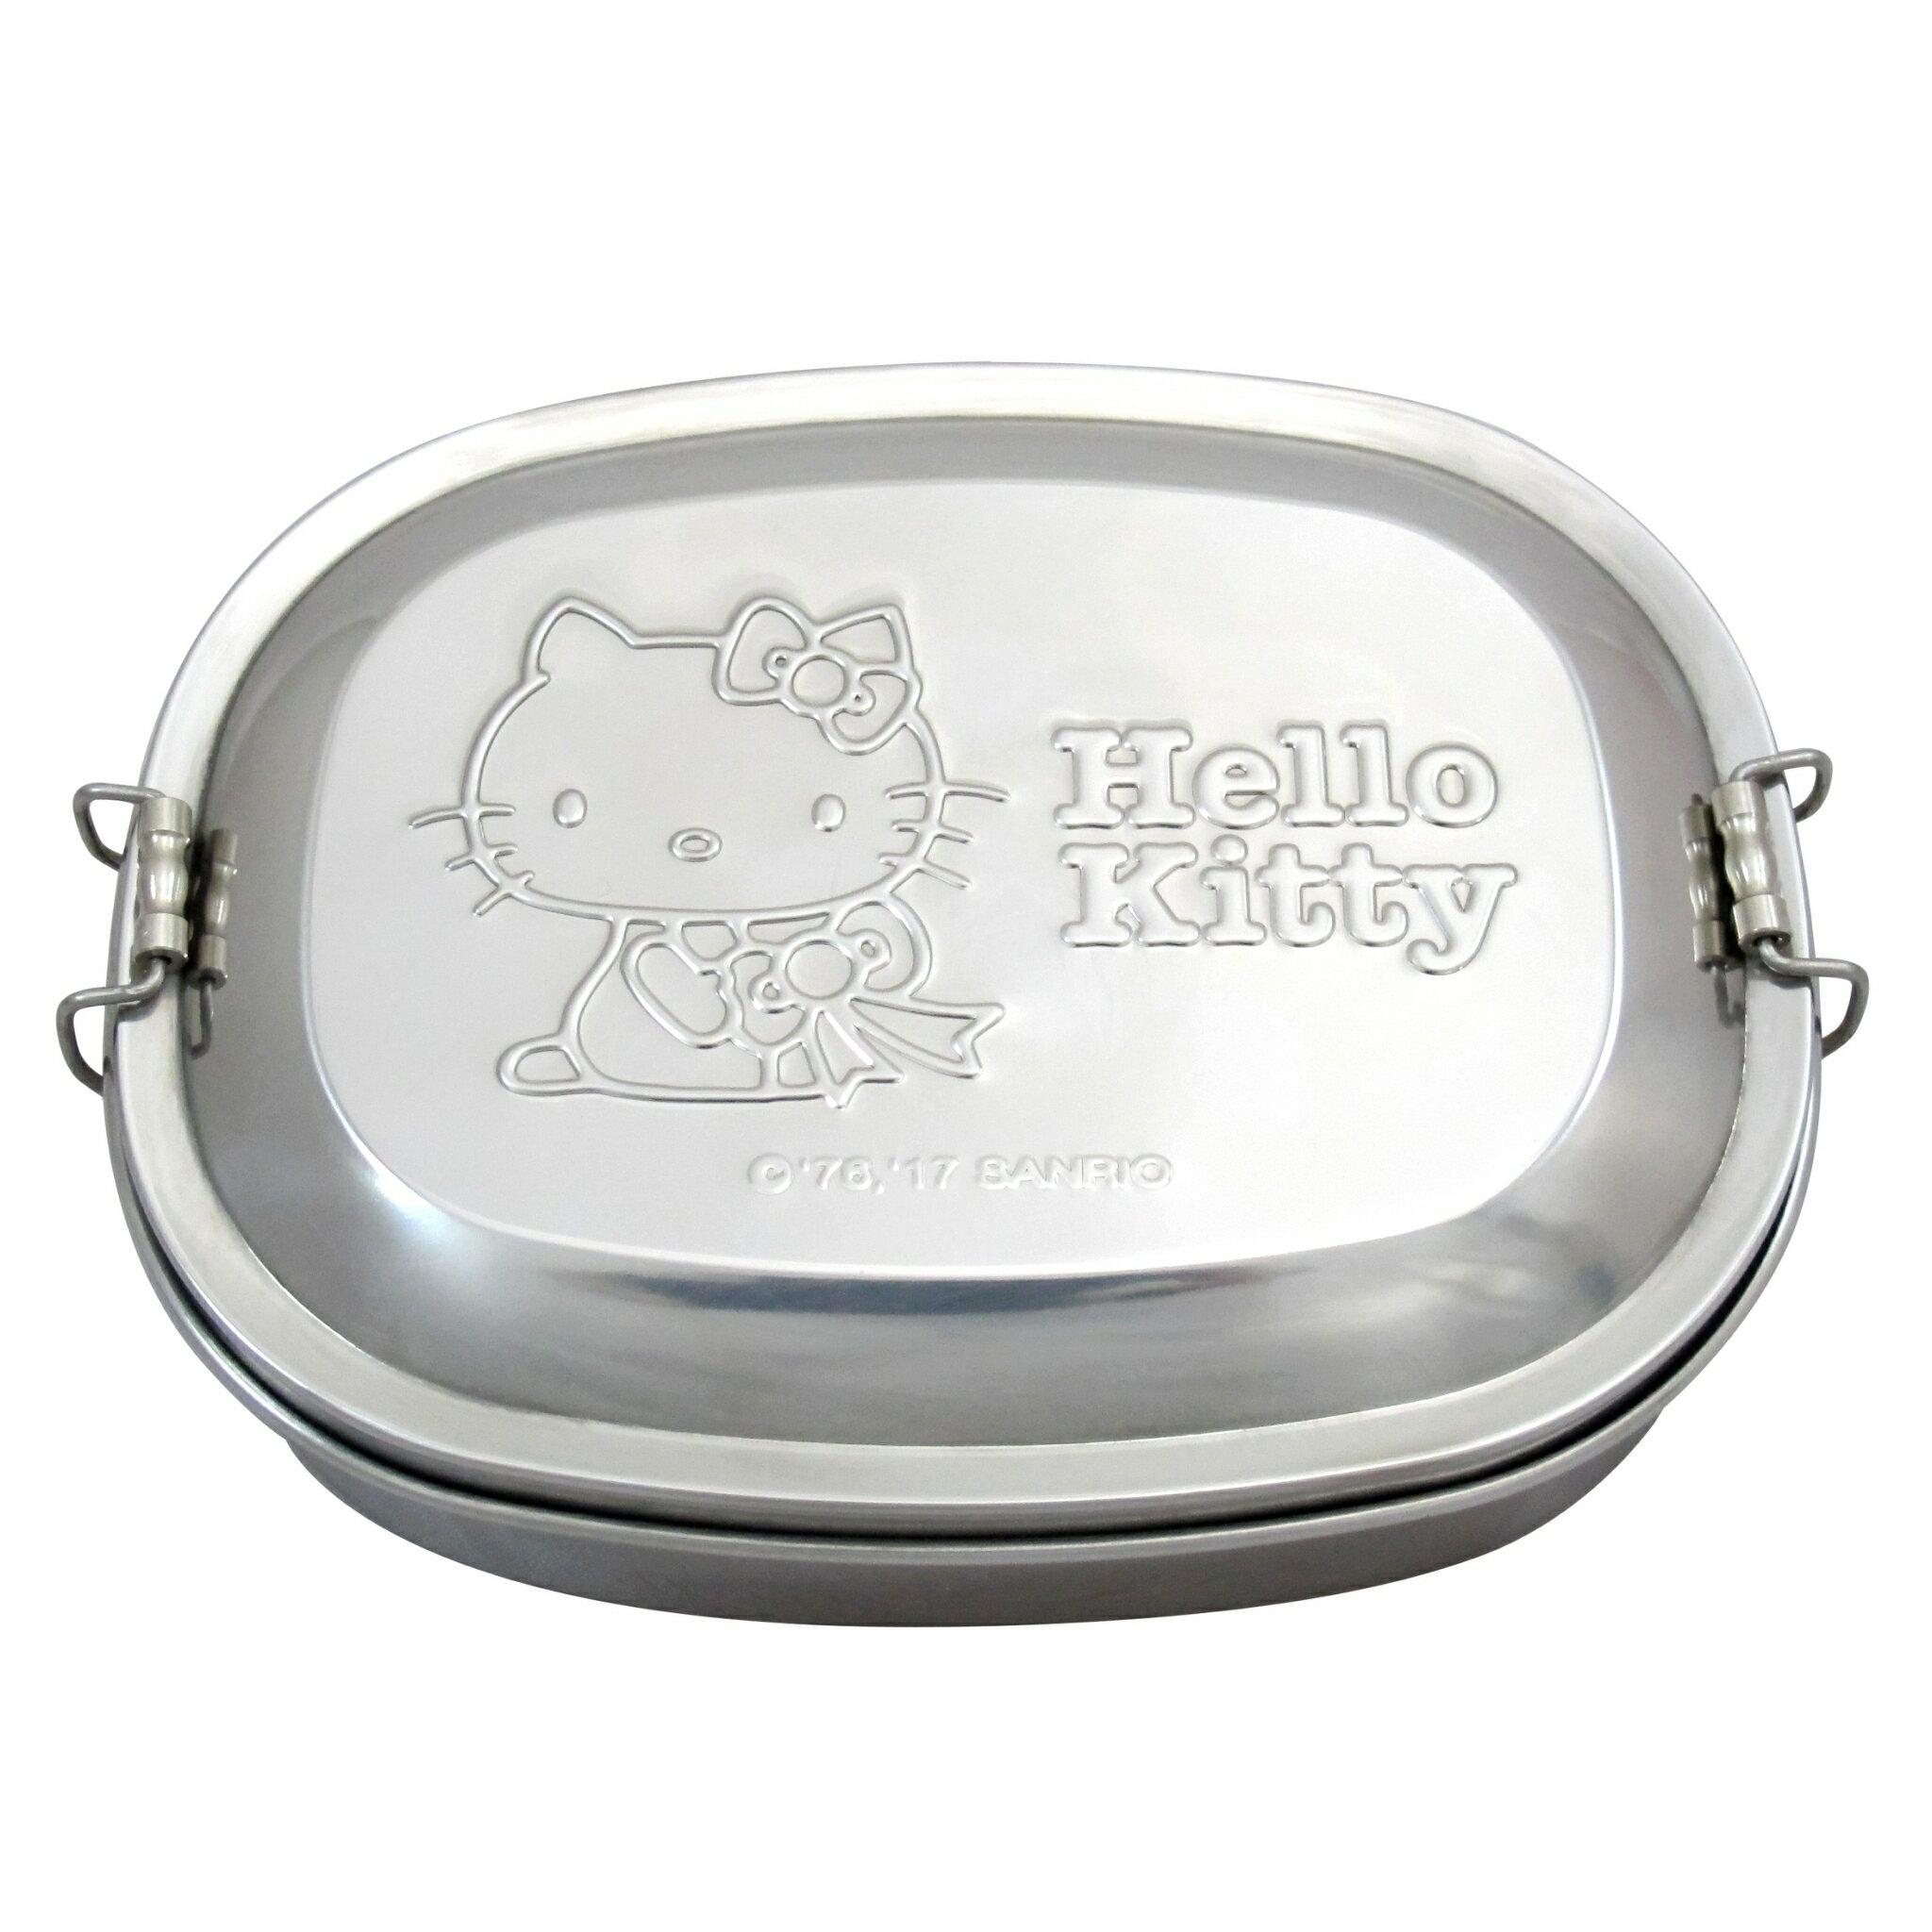 X射線【C168661】Hello Kitty 不鏽鋼便當盒,雙扣式餐盒/兒童餐具/環保安心